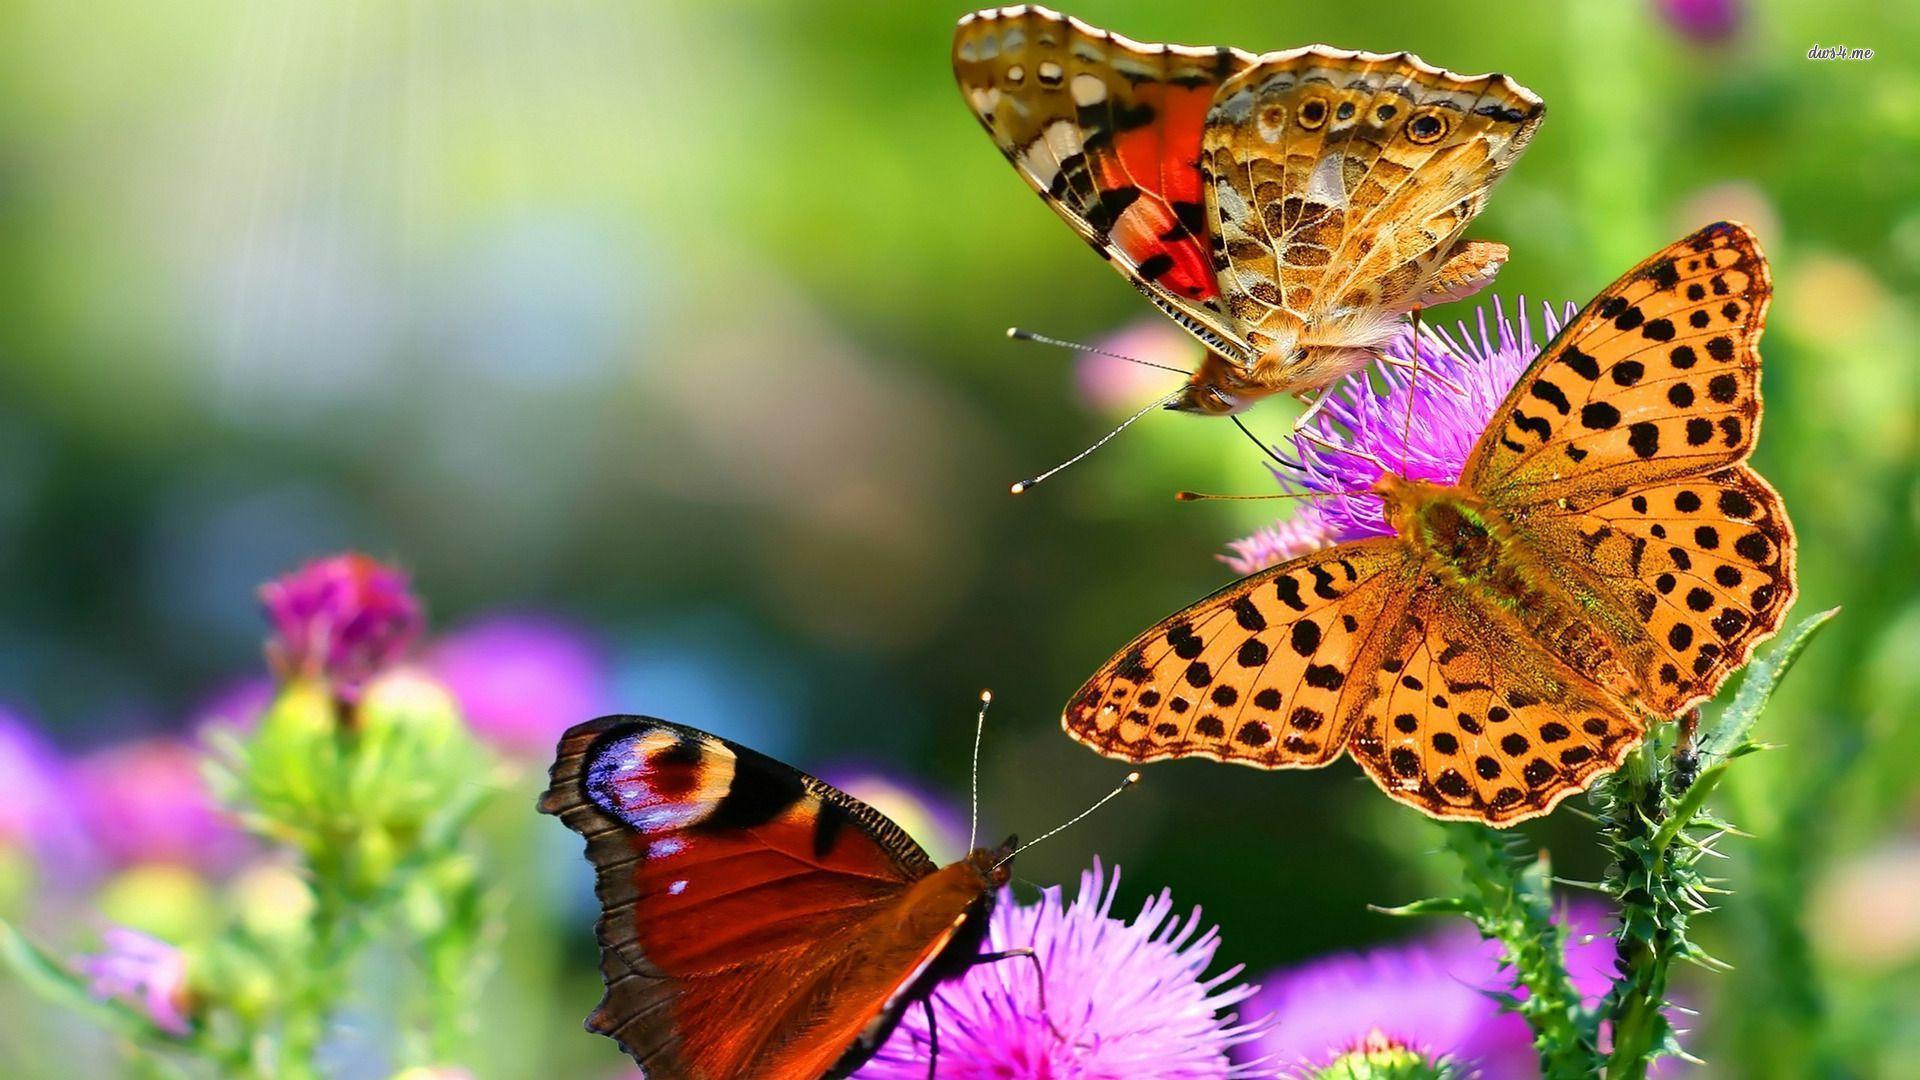 Butterfly Wallpaper Hd on WallpaperGet.com